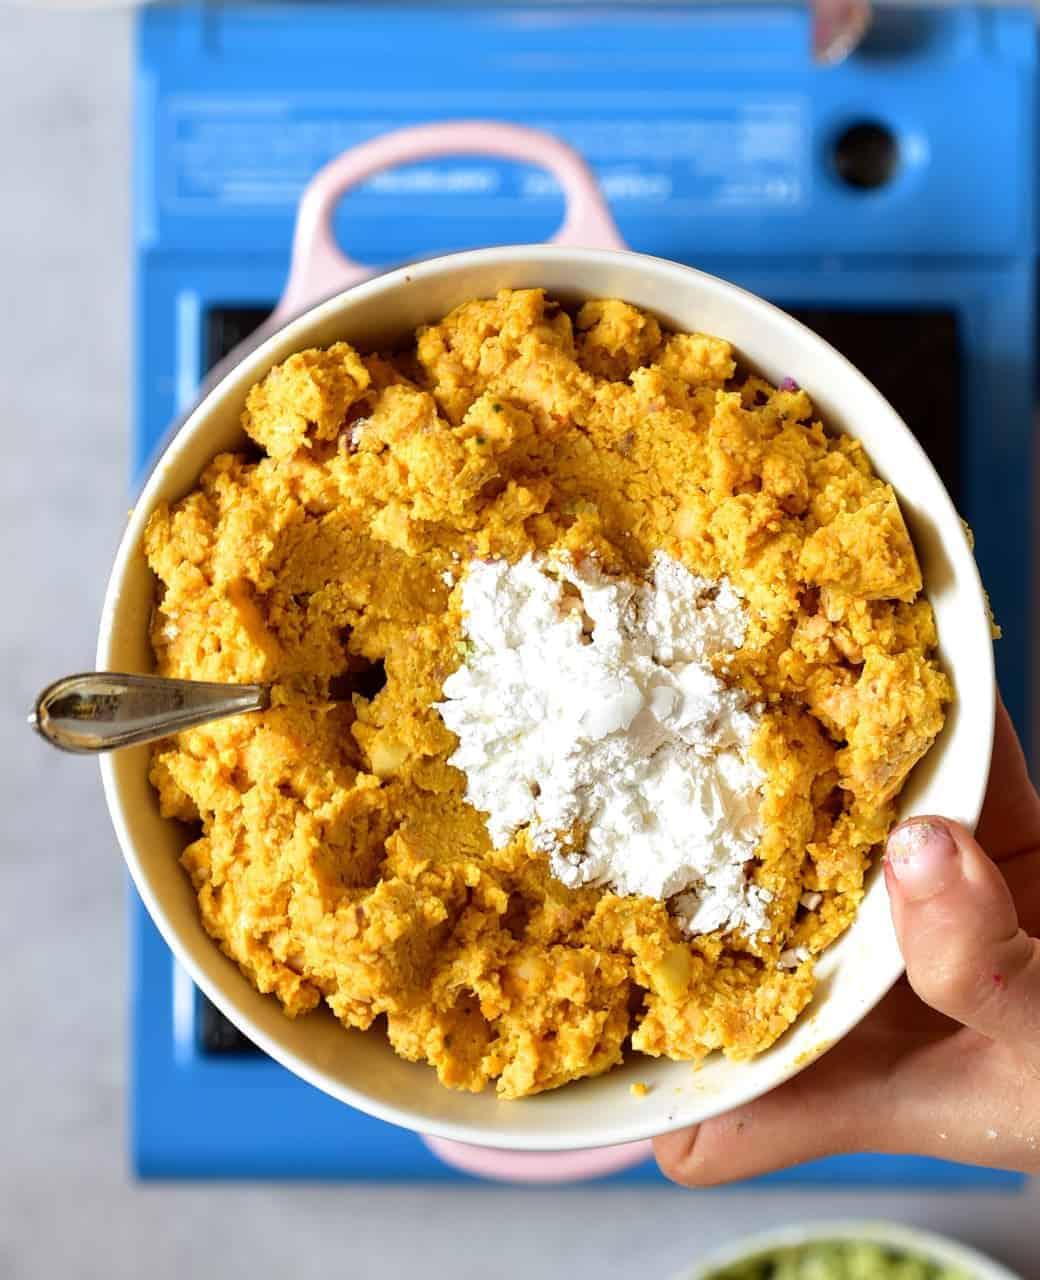 Orange falafel paste with baking powder, ready to be fried